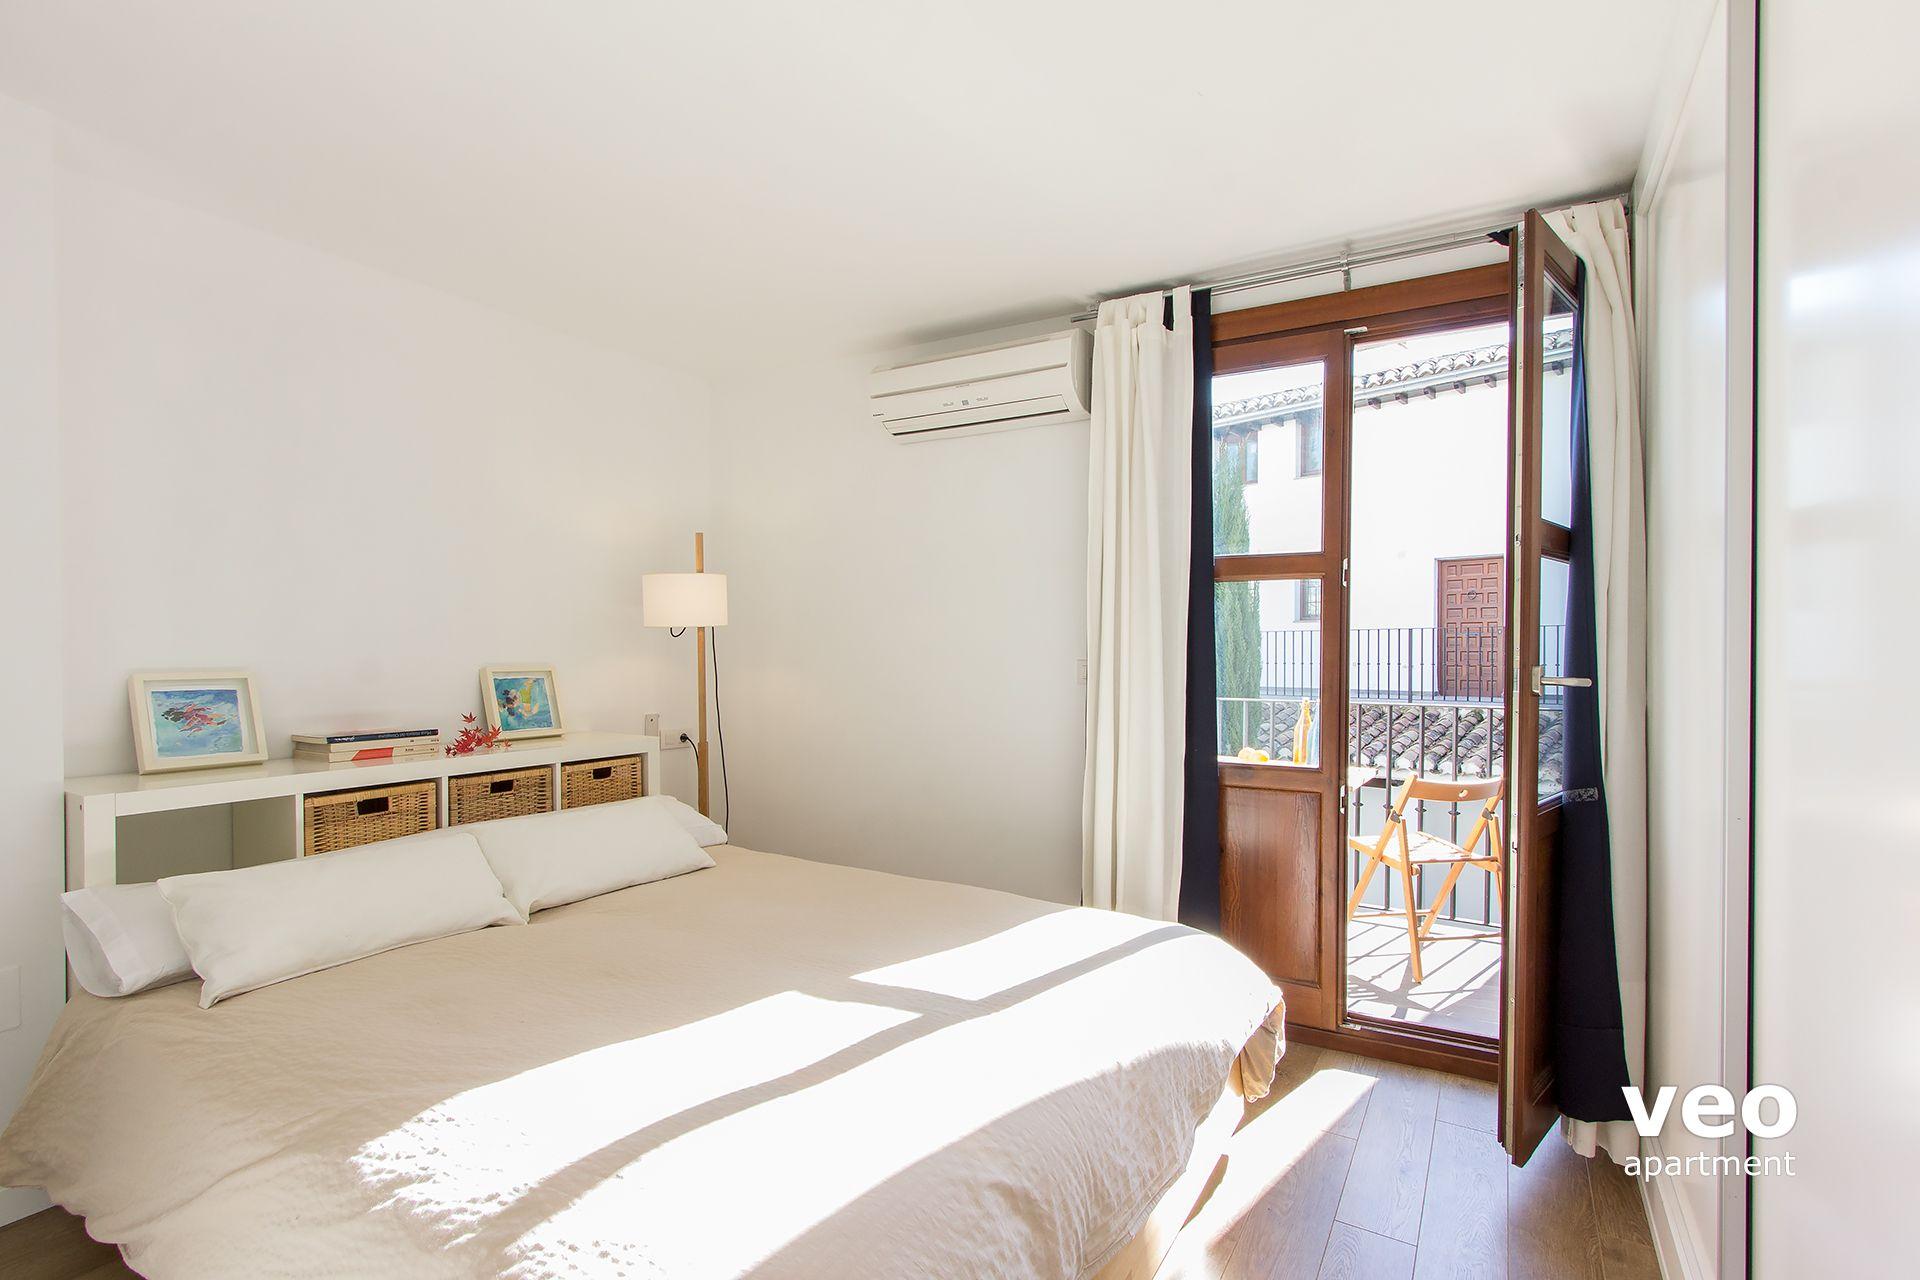 Apartment Mieten San Jose Alta Strasse Granada Spanien San Jose 5